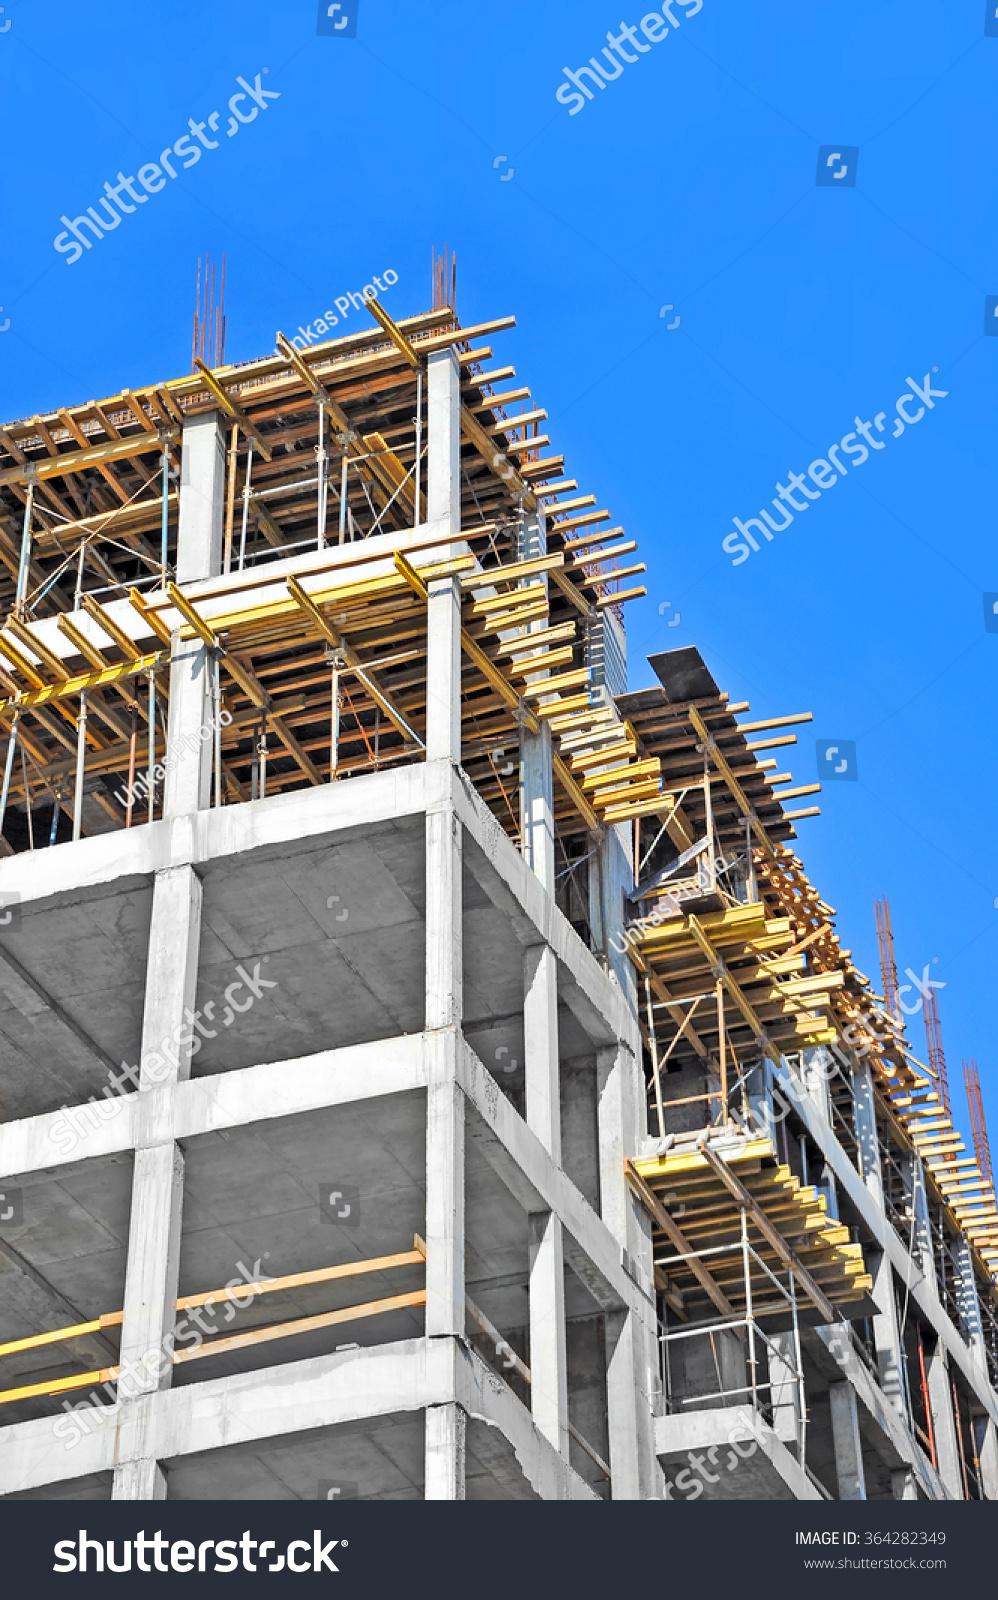 Building Construction Site : Building construction site work against blue sky stock